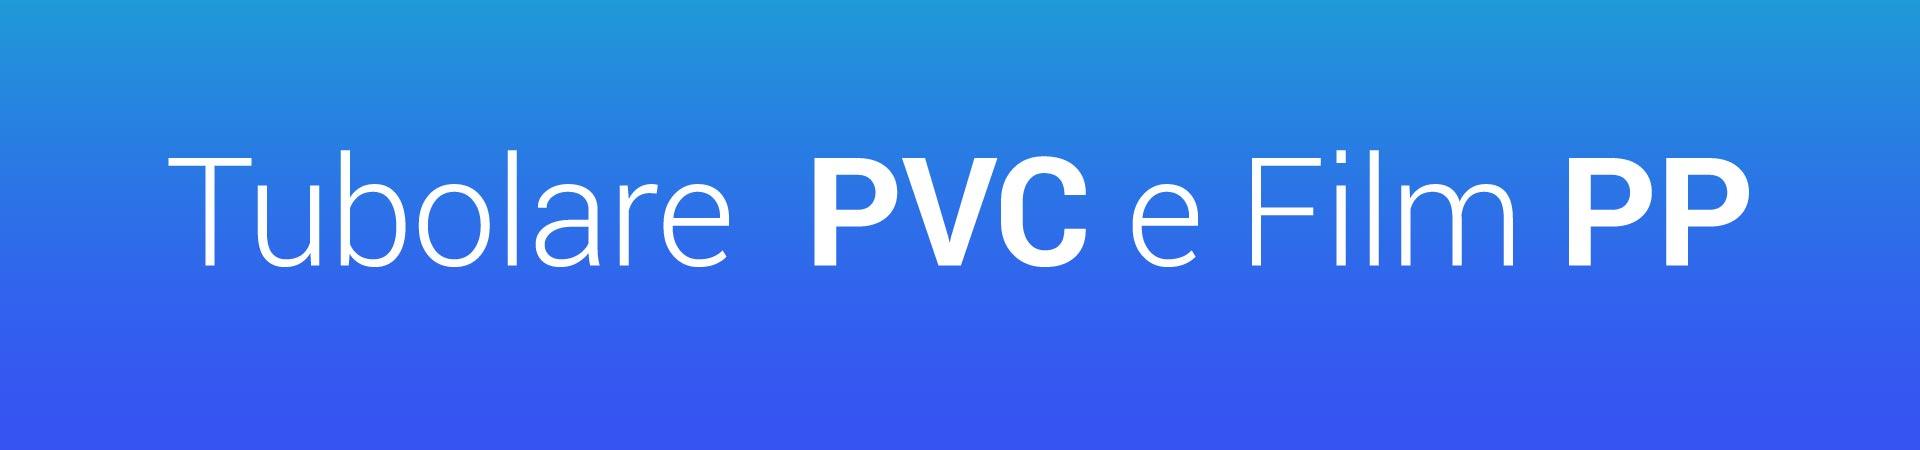 Tubolare-PVC-e-Film-PP